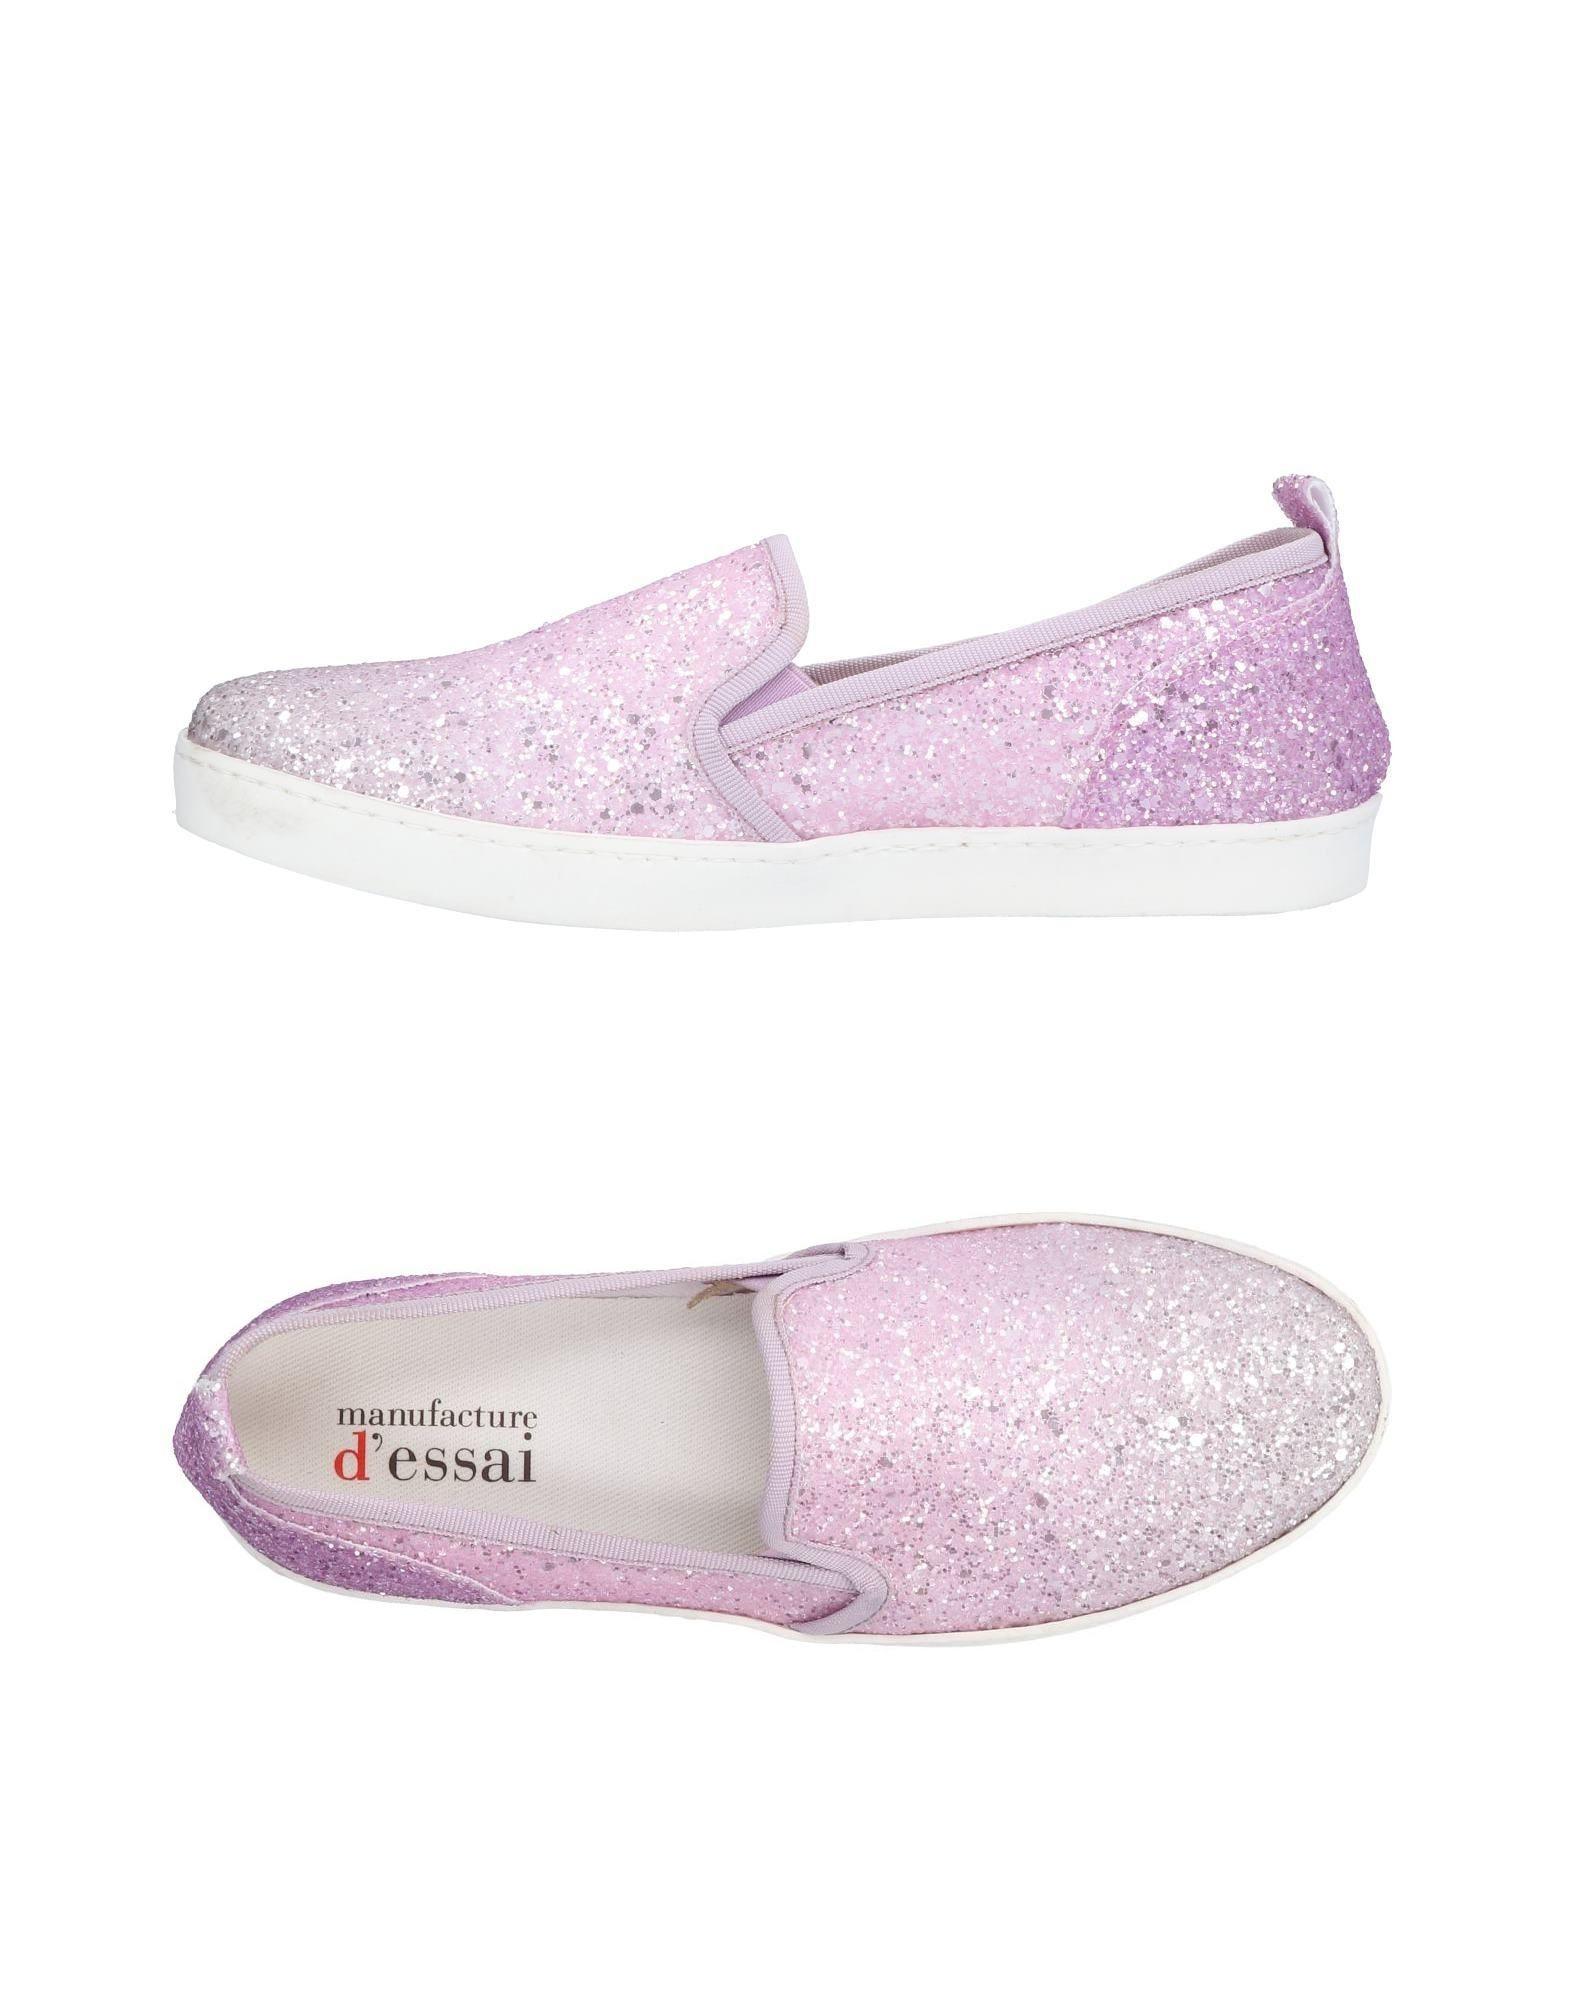 Sneakers Manufacture Dessai Femme - Sneakers Manufacture Dessai sur